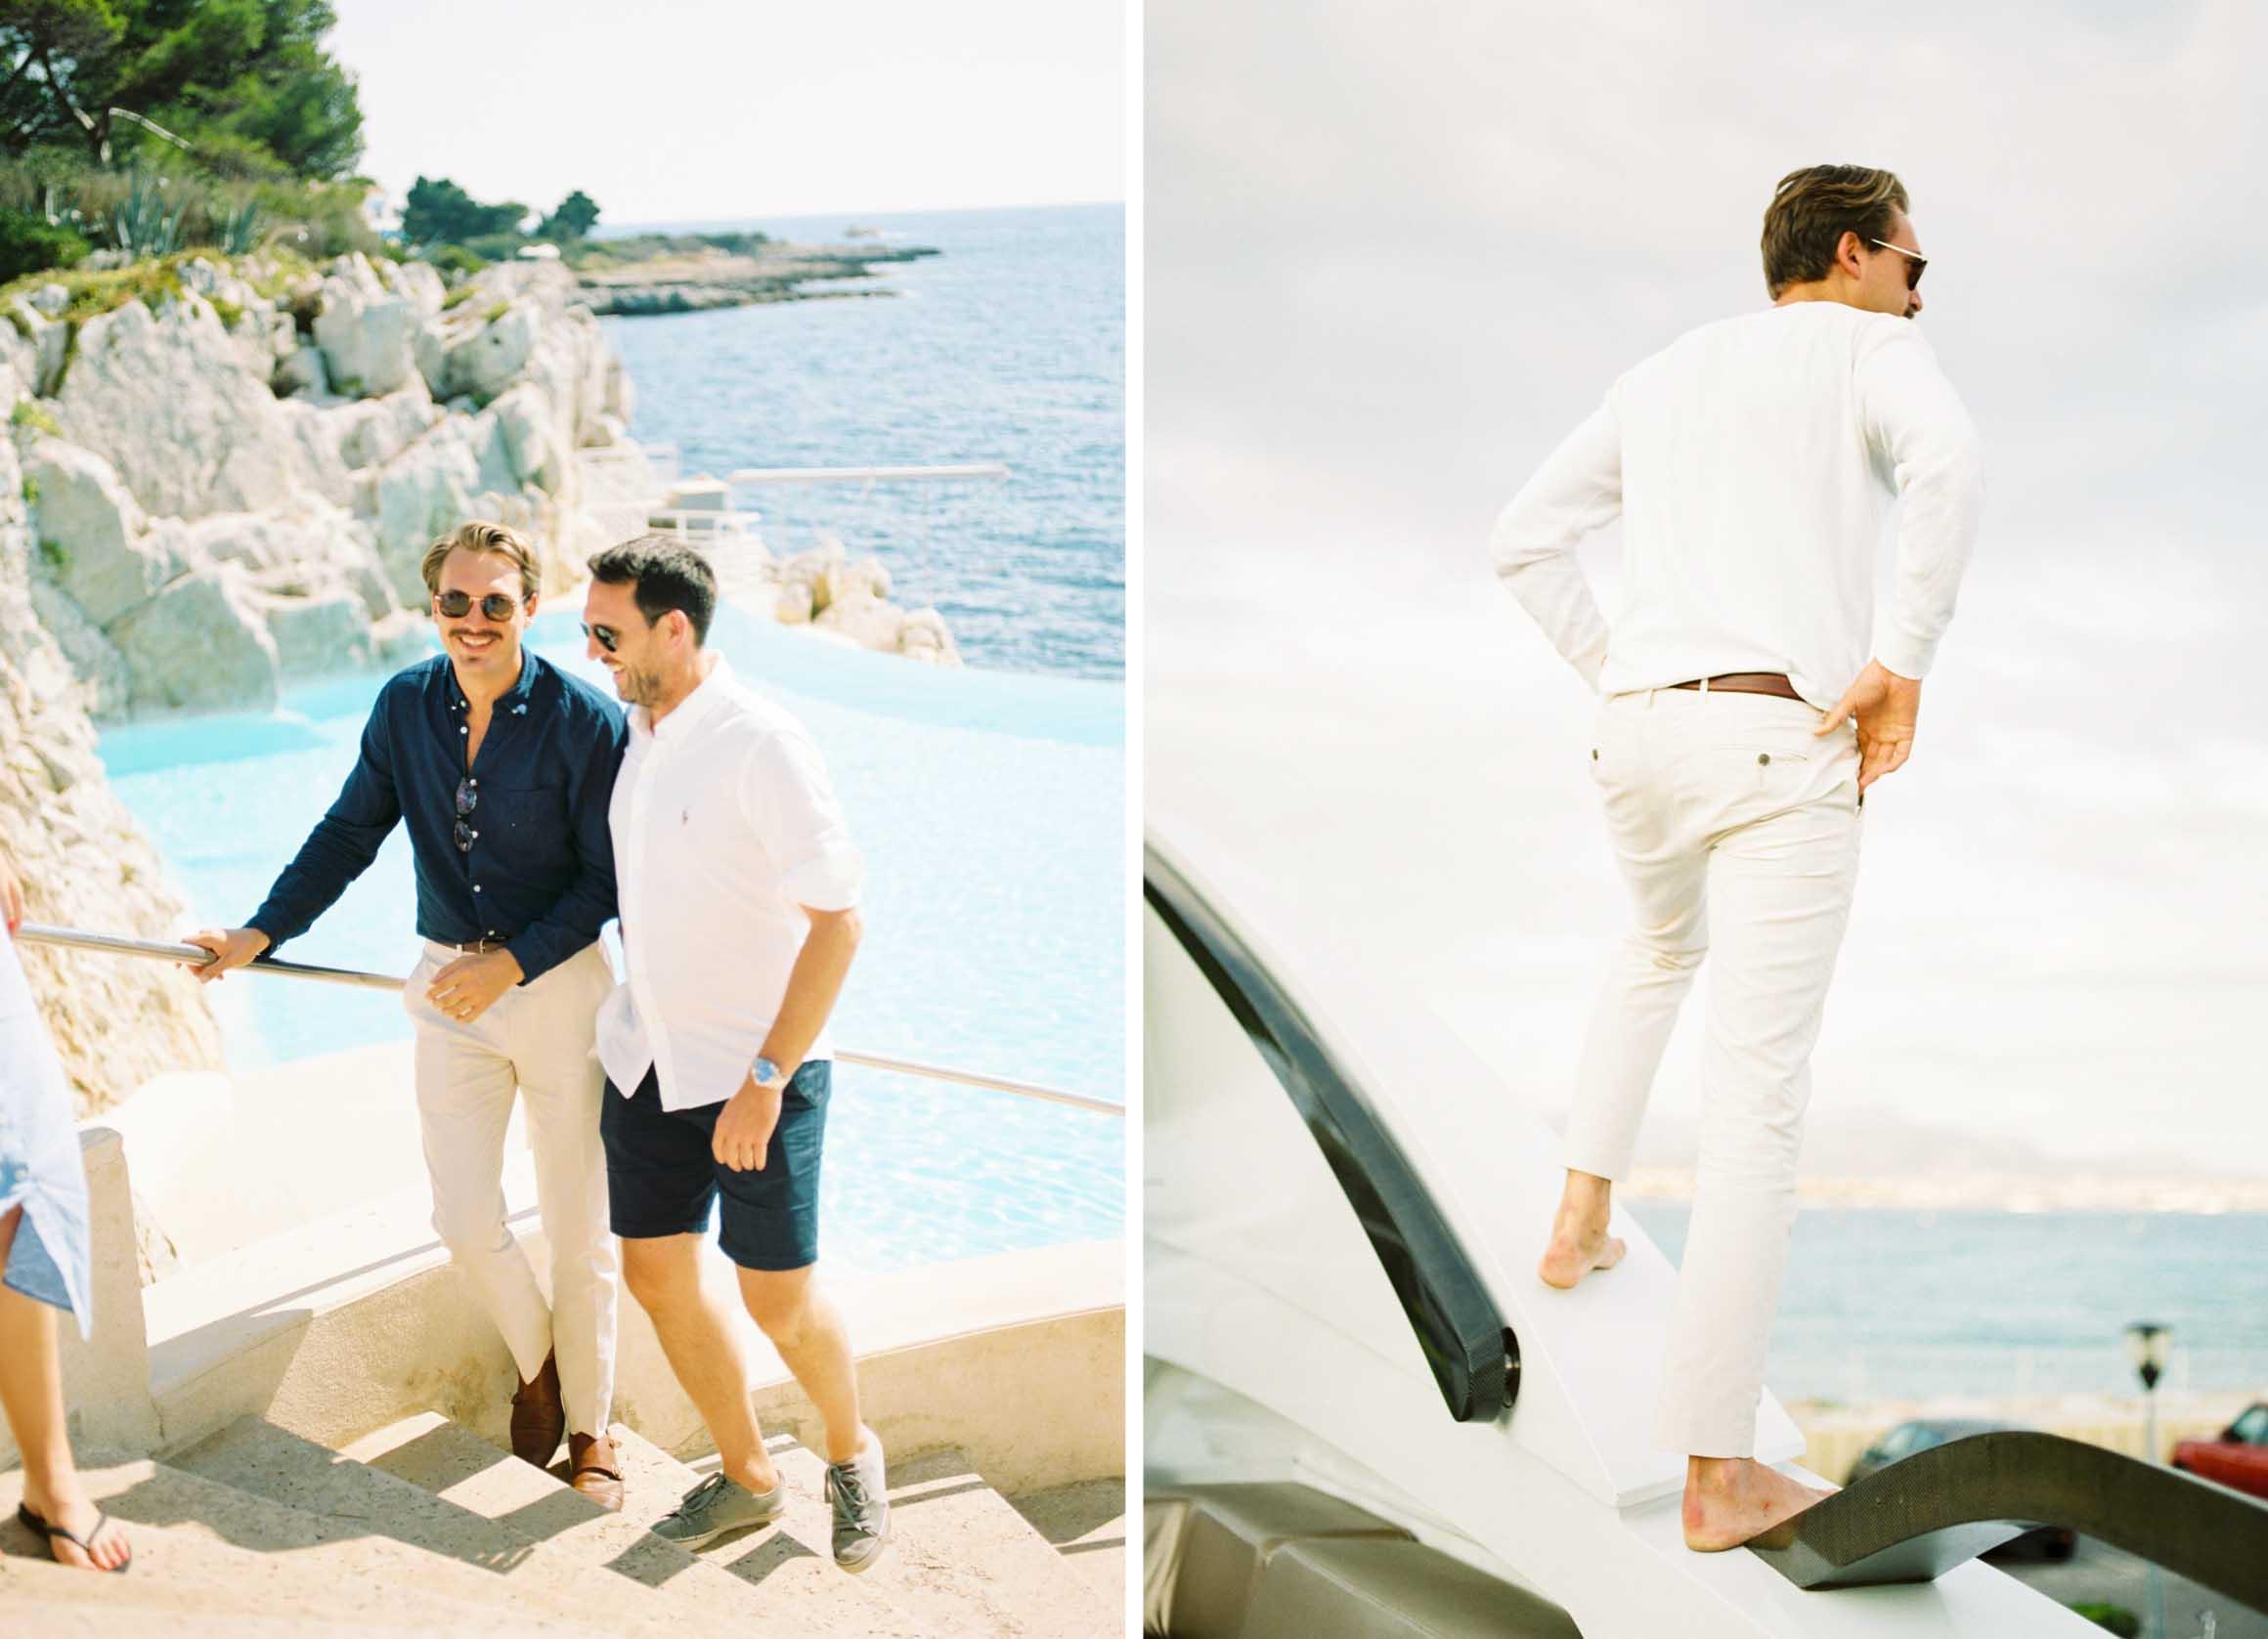 Amy O'Boyle Photography- Destination & UK Fine Art Film Wedding Photographer- South of France Hotel Du Cao Eden Roc St Tropez Yacht 12.jpg